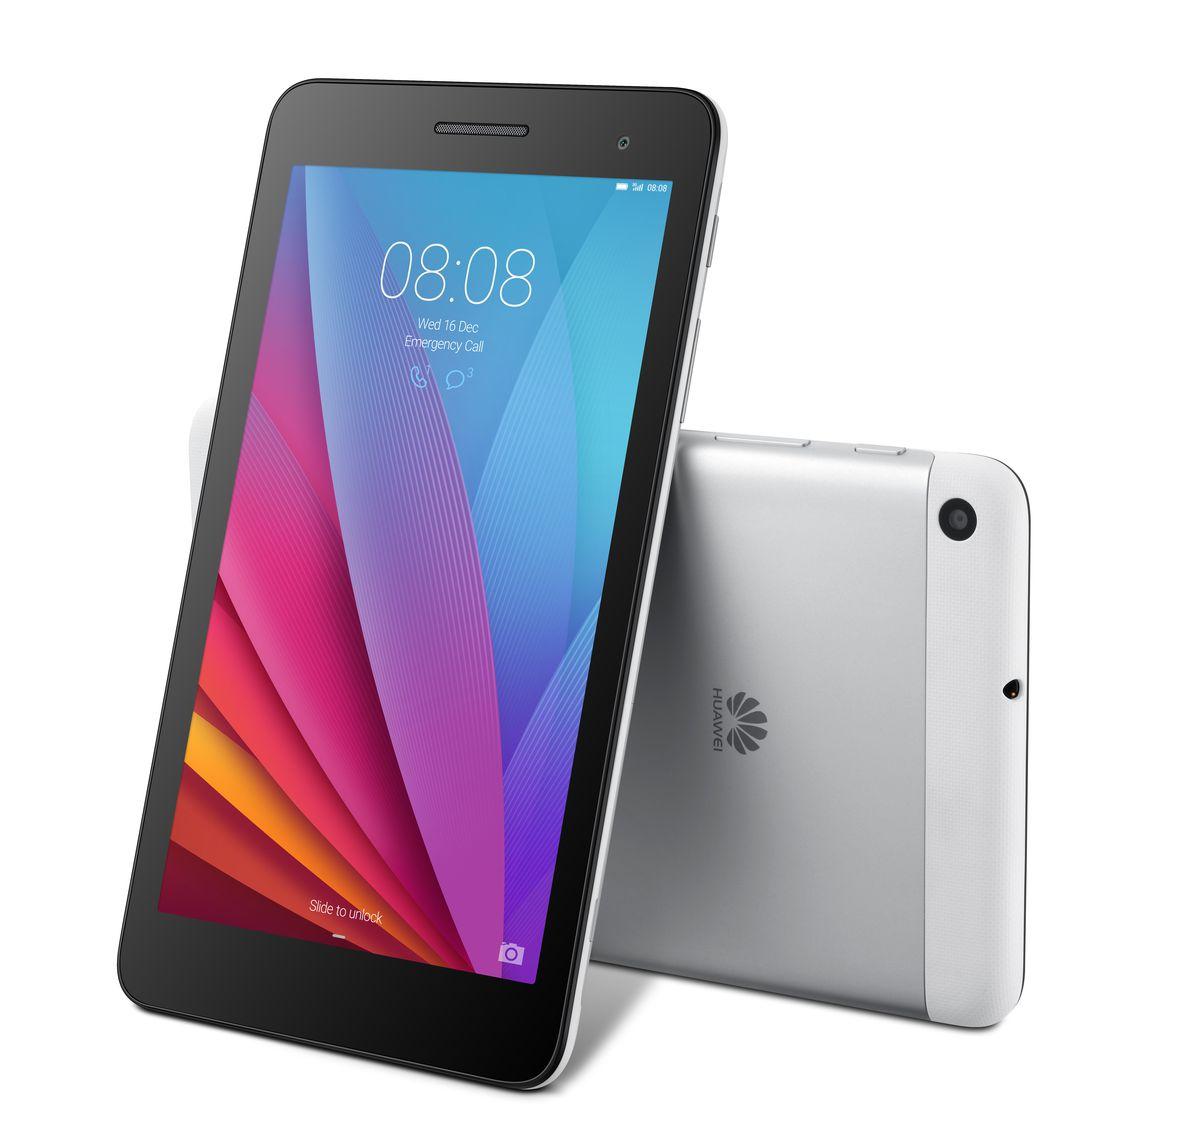 huawei 8 inch tablet. huawei mediapad t1 7\u0027\u0027 8gb tablet. loading zoom 8 inch tablet t